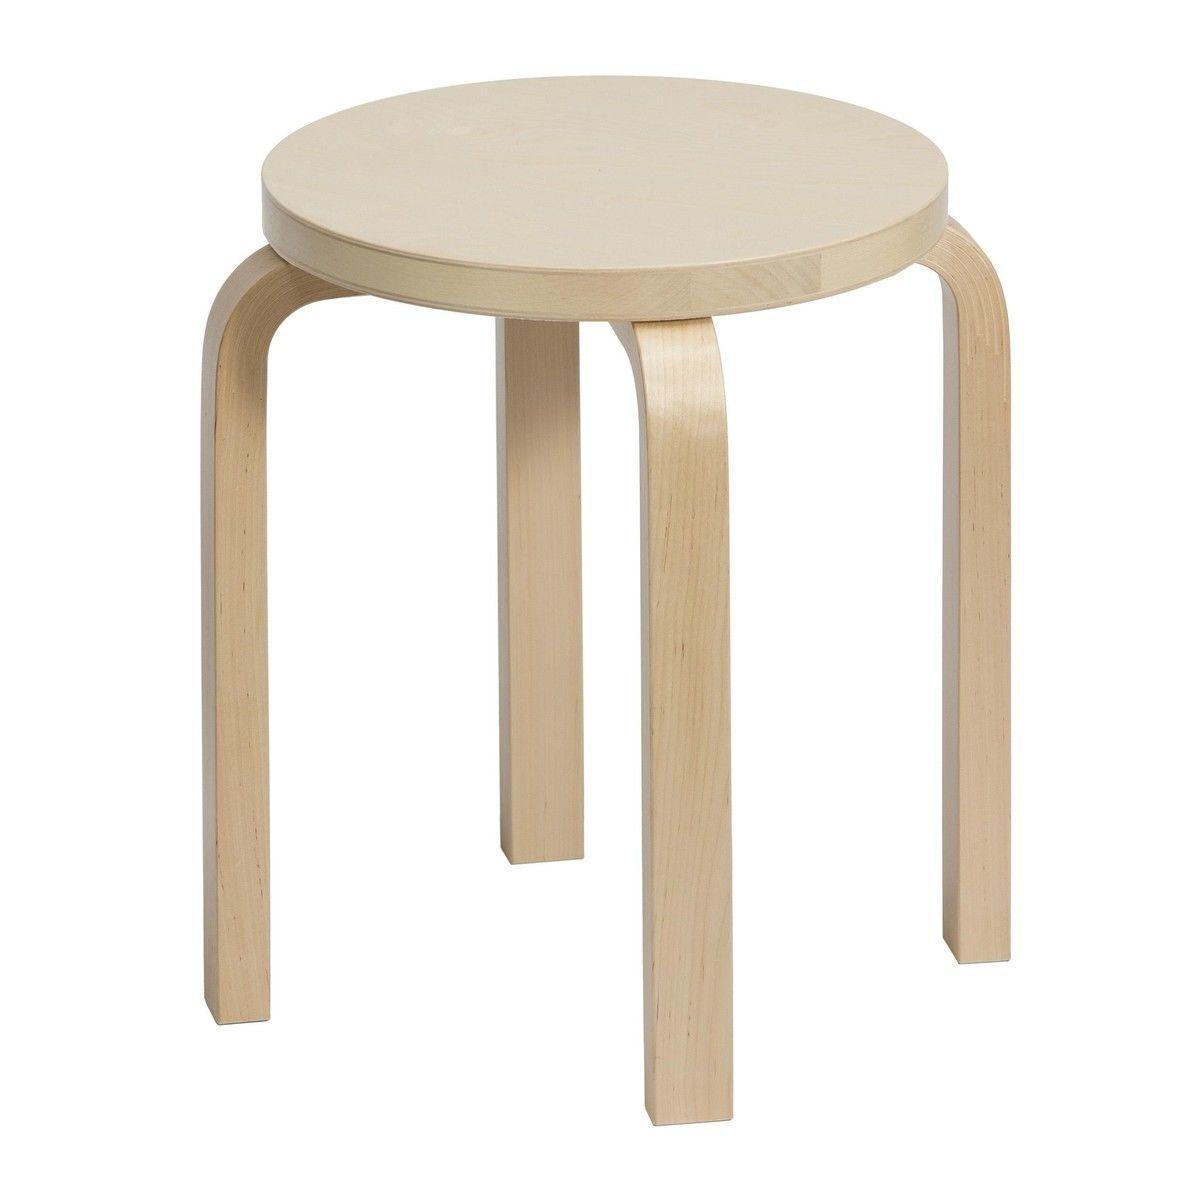 artek e stool  artek  ambientedirectcom - artek  artek e stool  birch veneerlegs birch transparent lacqu